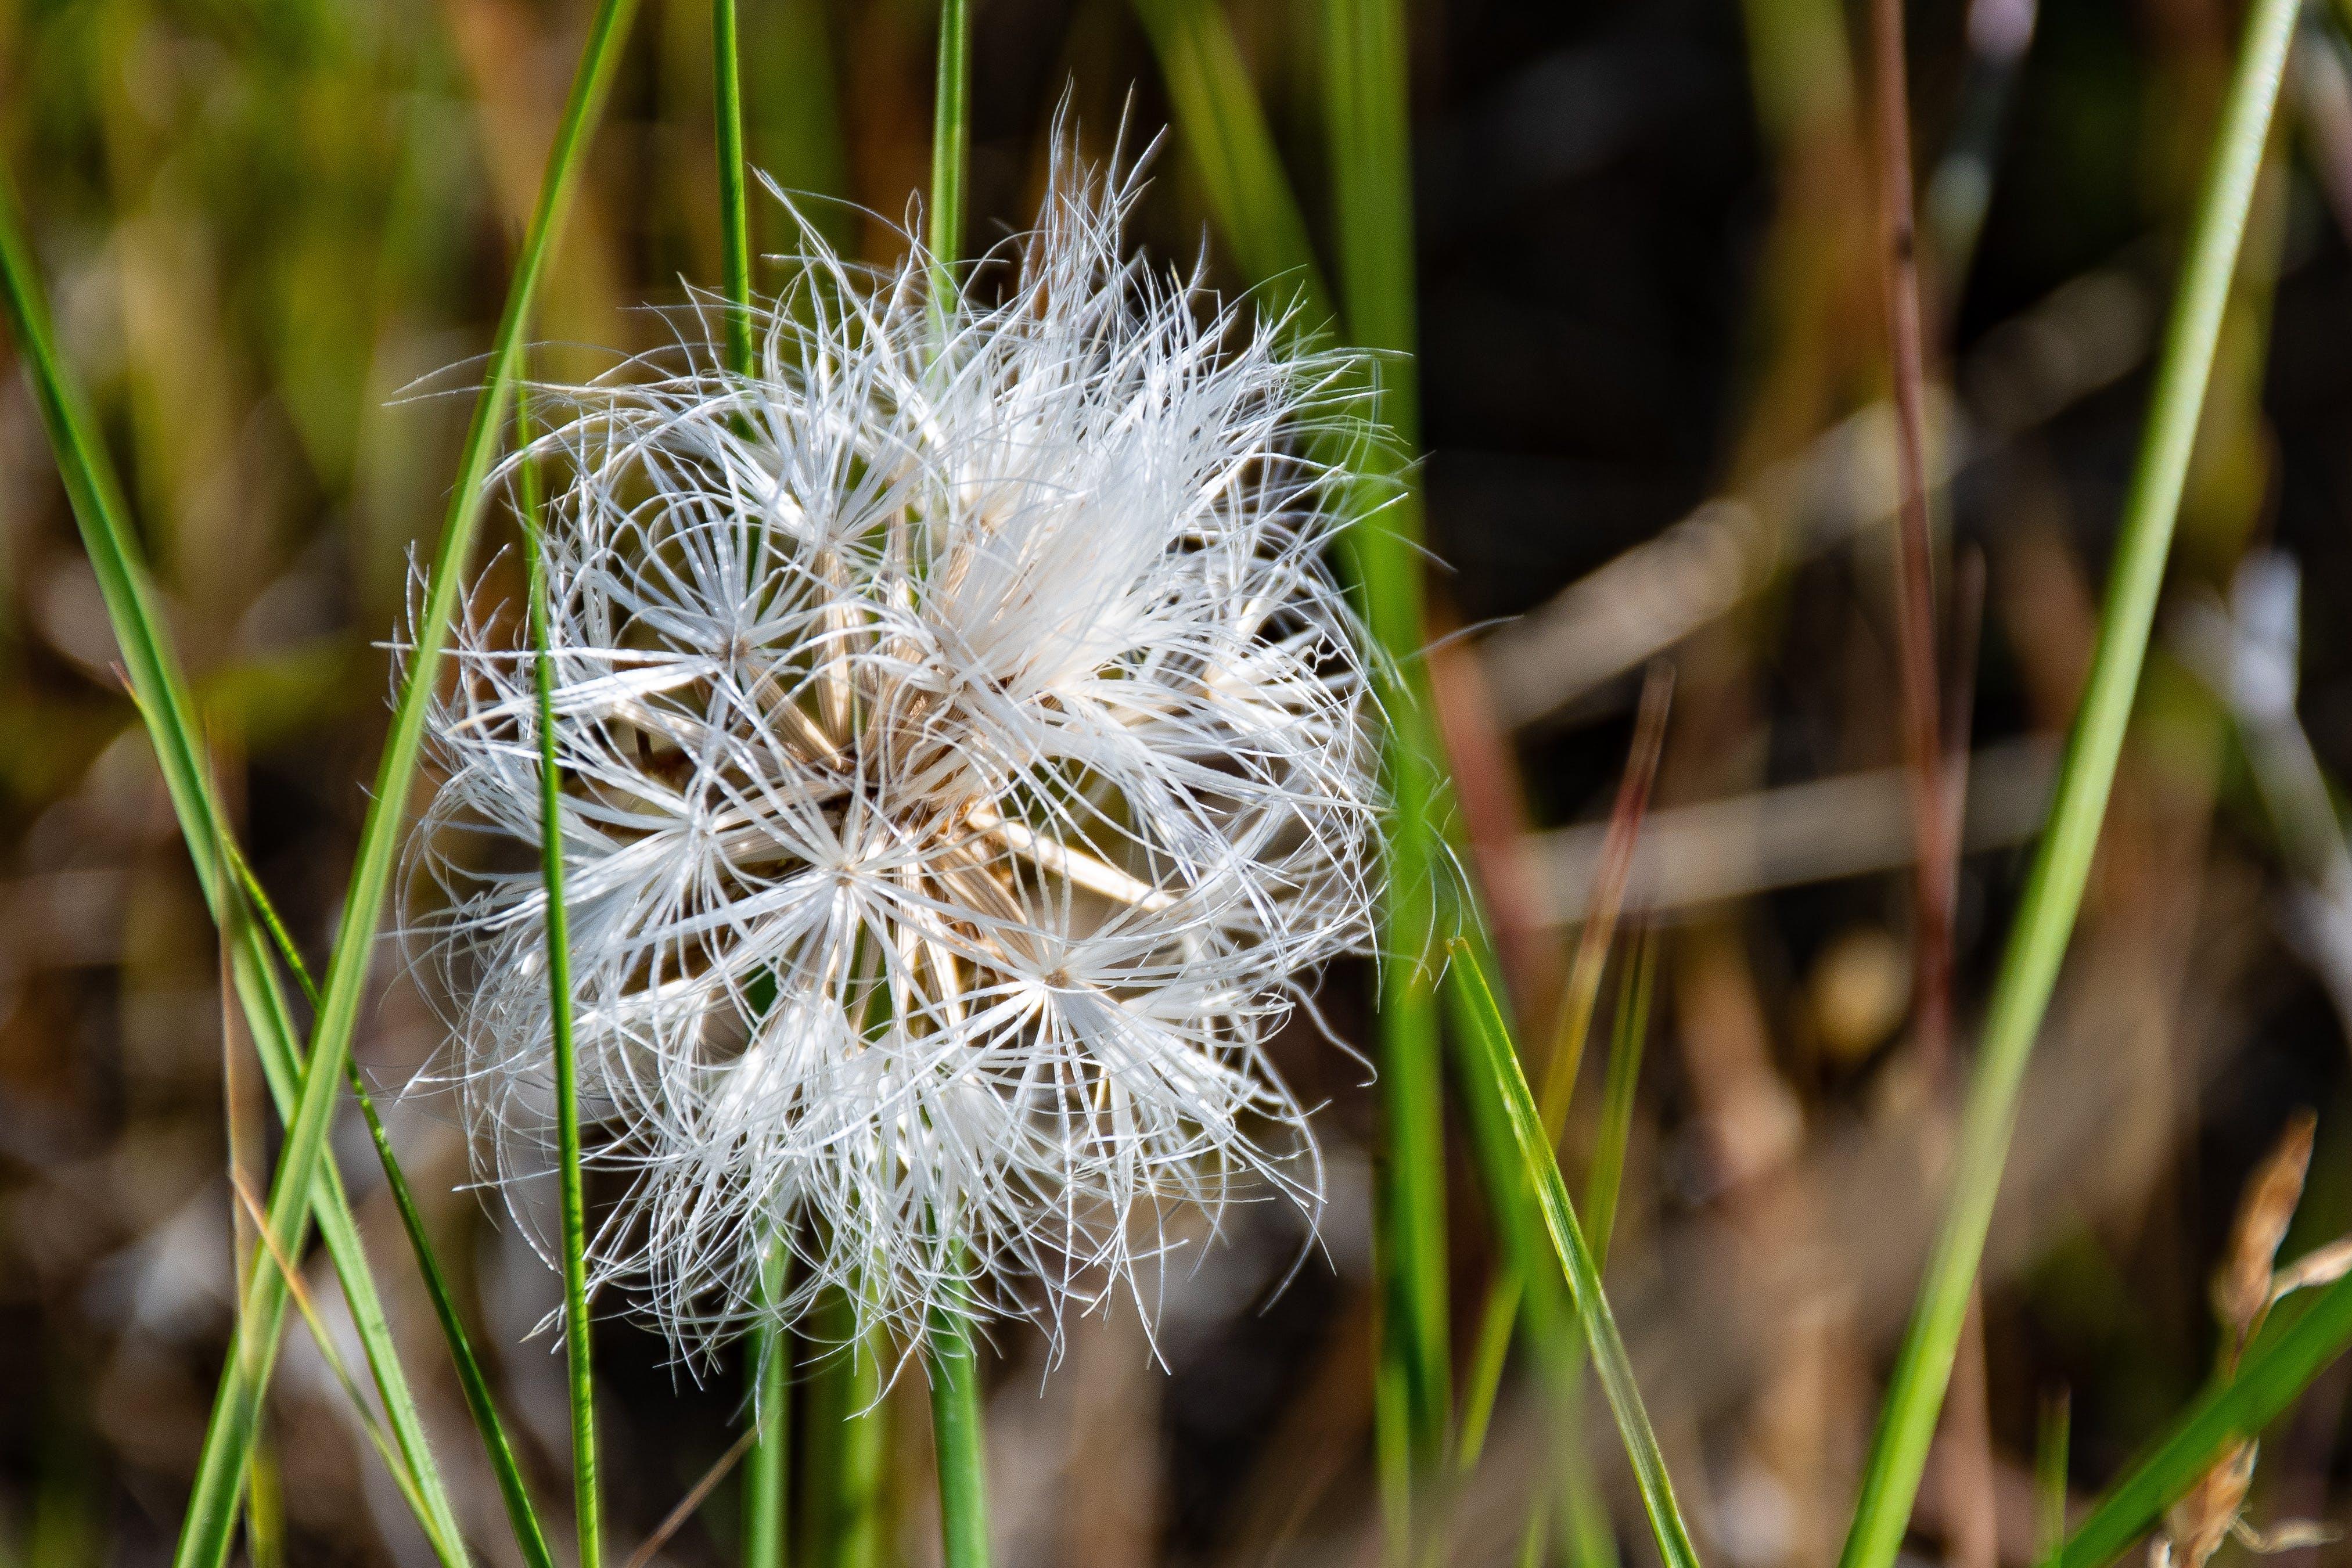 White Dandelion Flower at Daytime